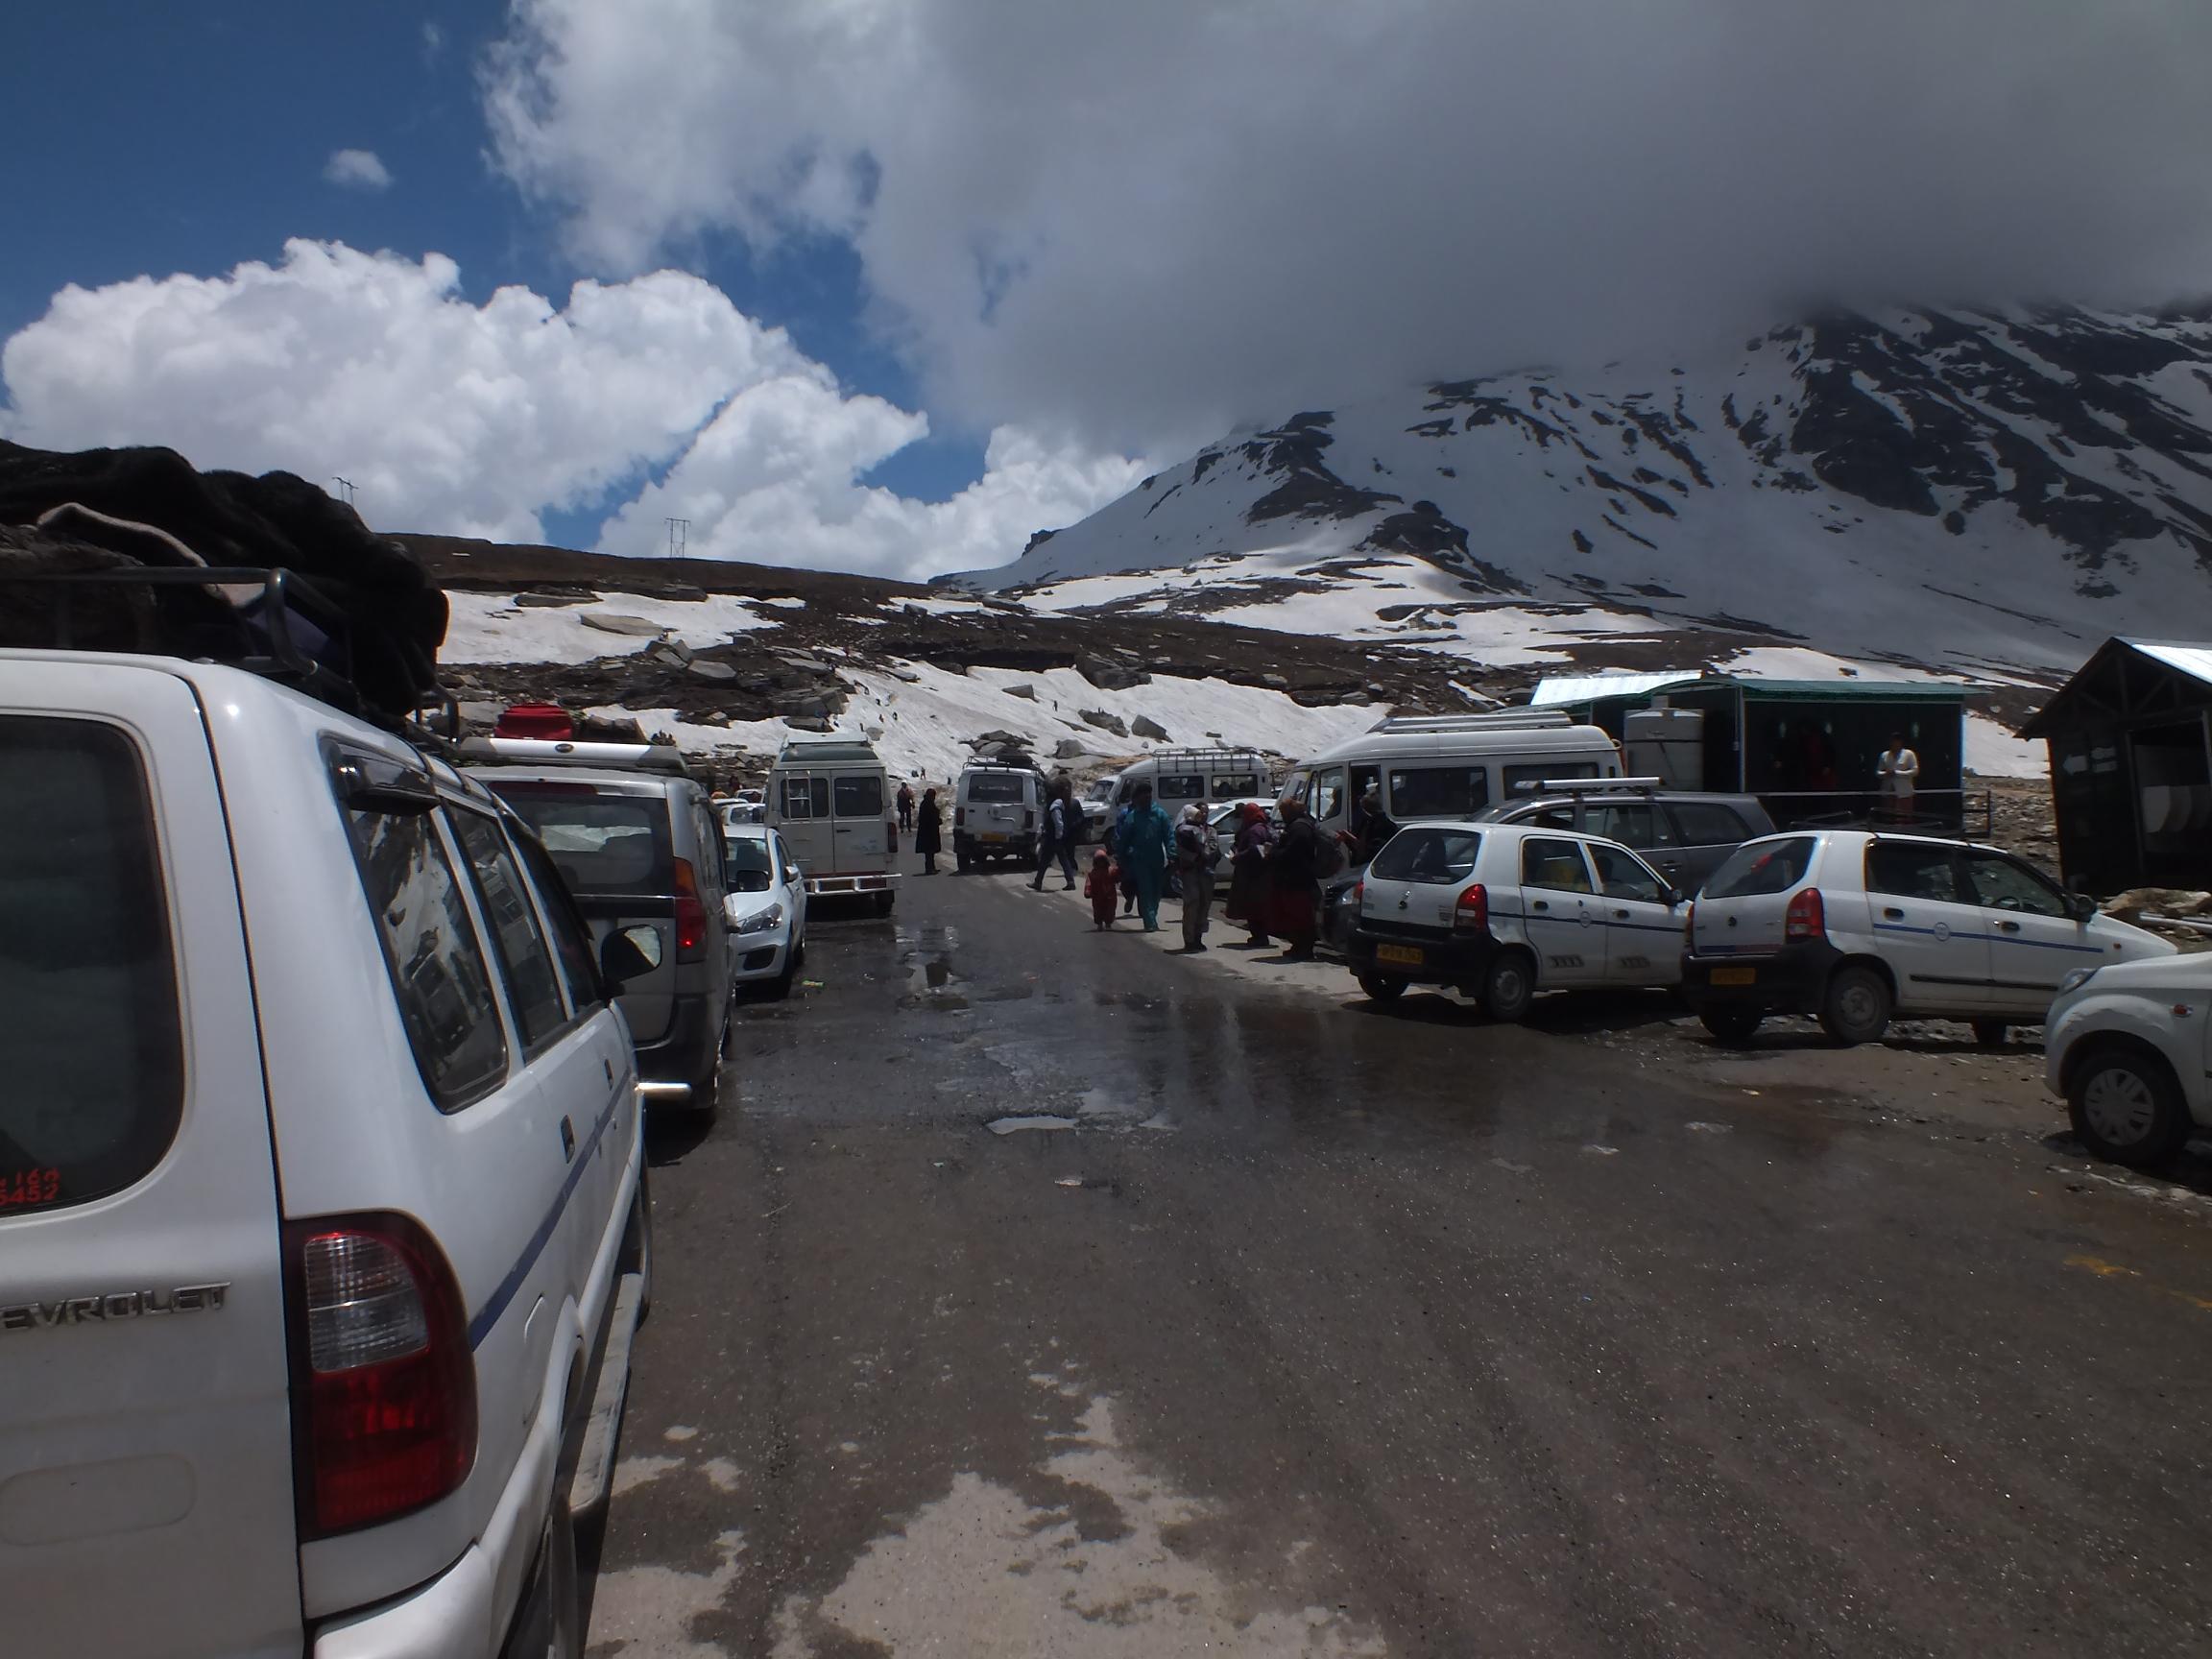 Parkoló autók a Rohtang-hágón<br /><br /><br /><br /><br /><br /><br /><br /><br /><br /><br />Saját fotó